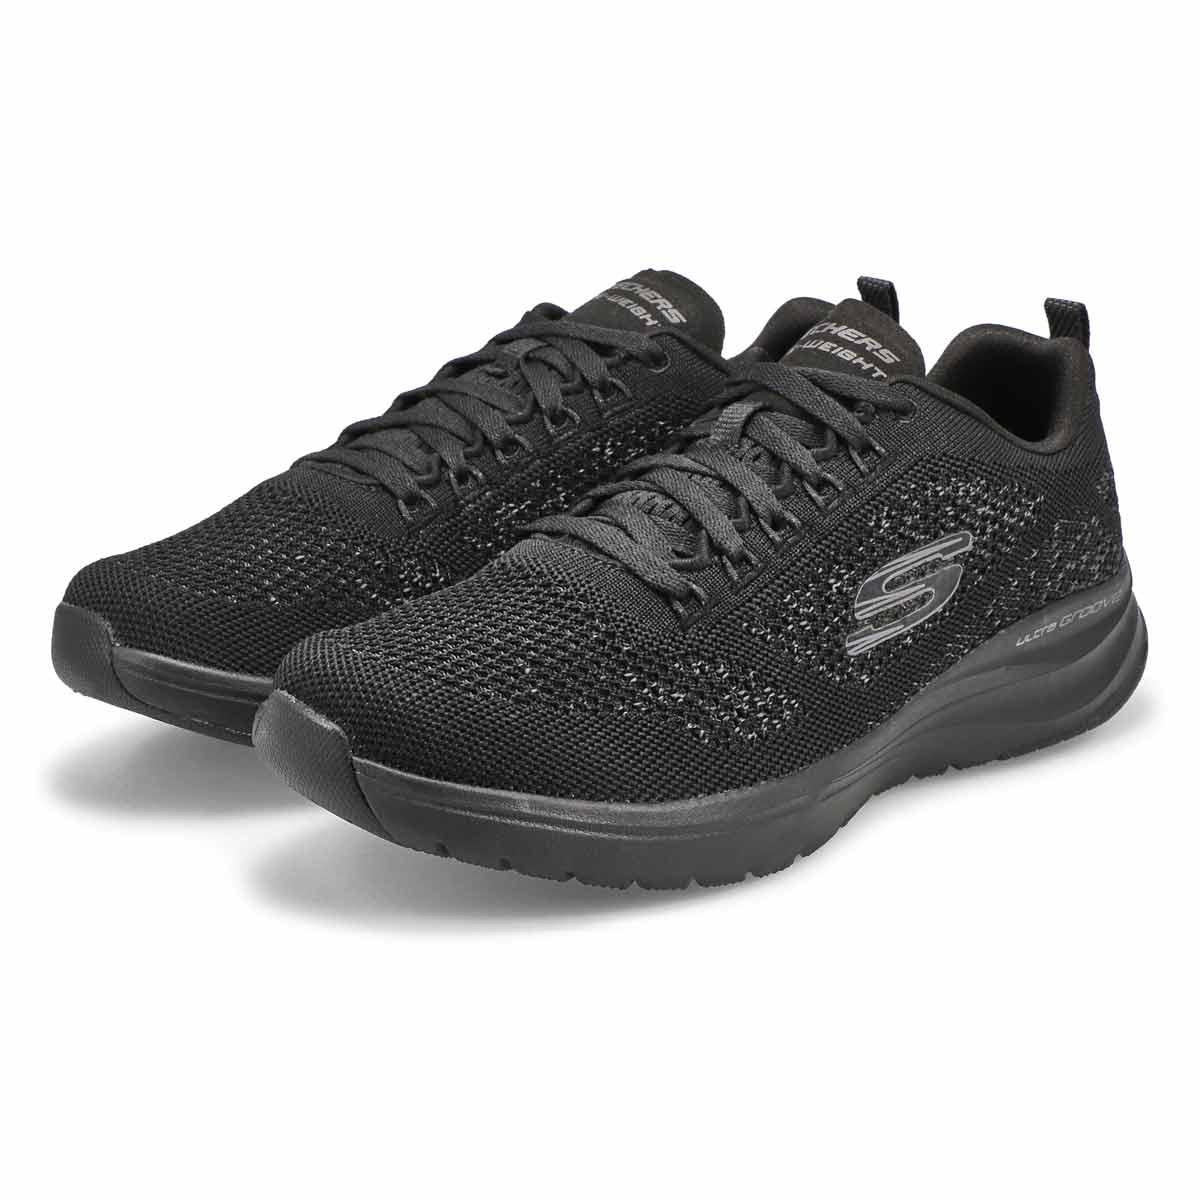 Mns Ultra Groove black running shoe